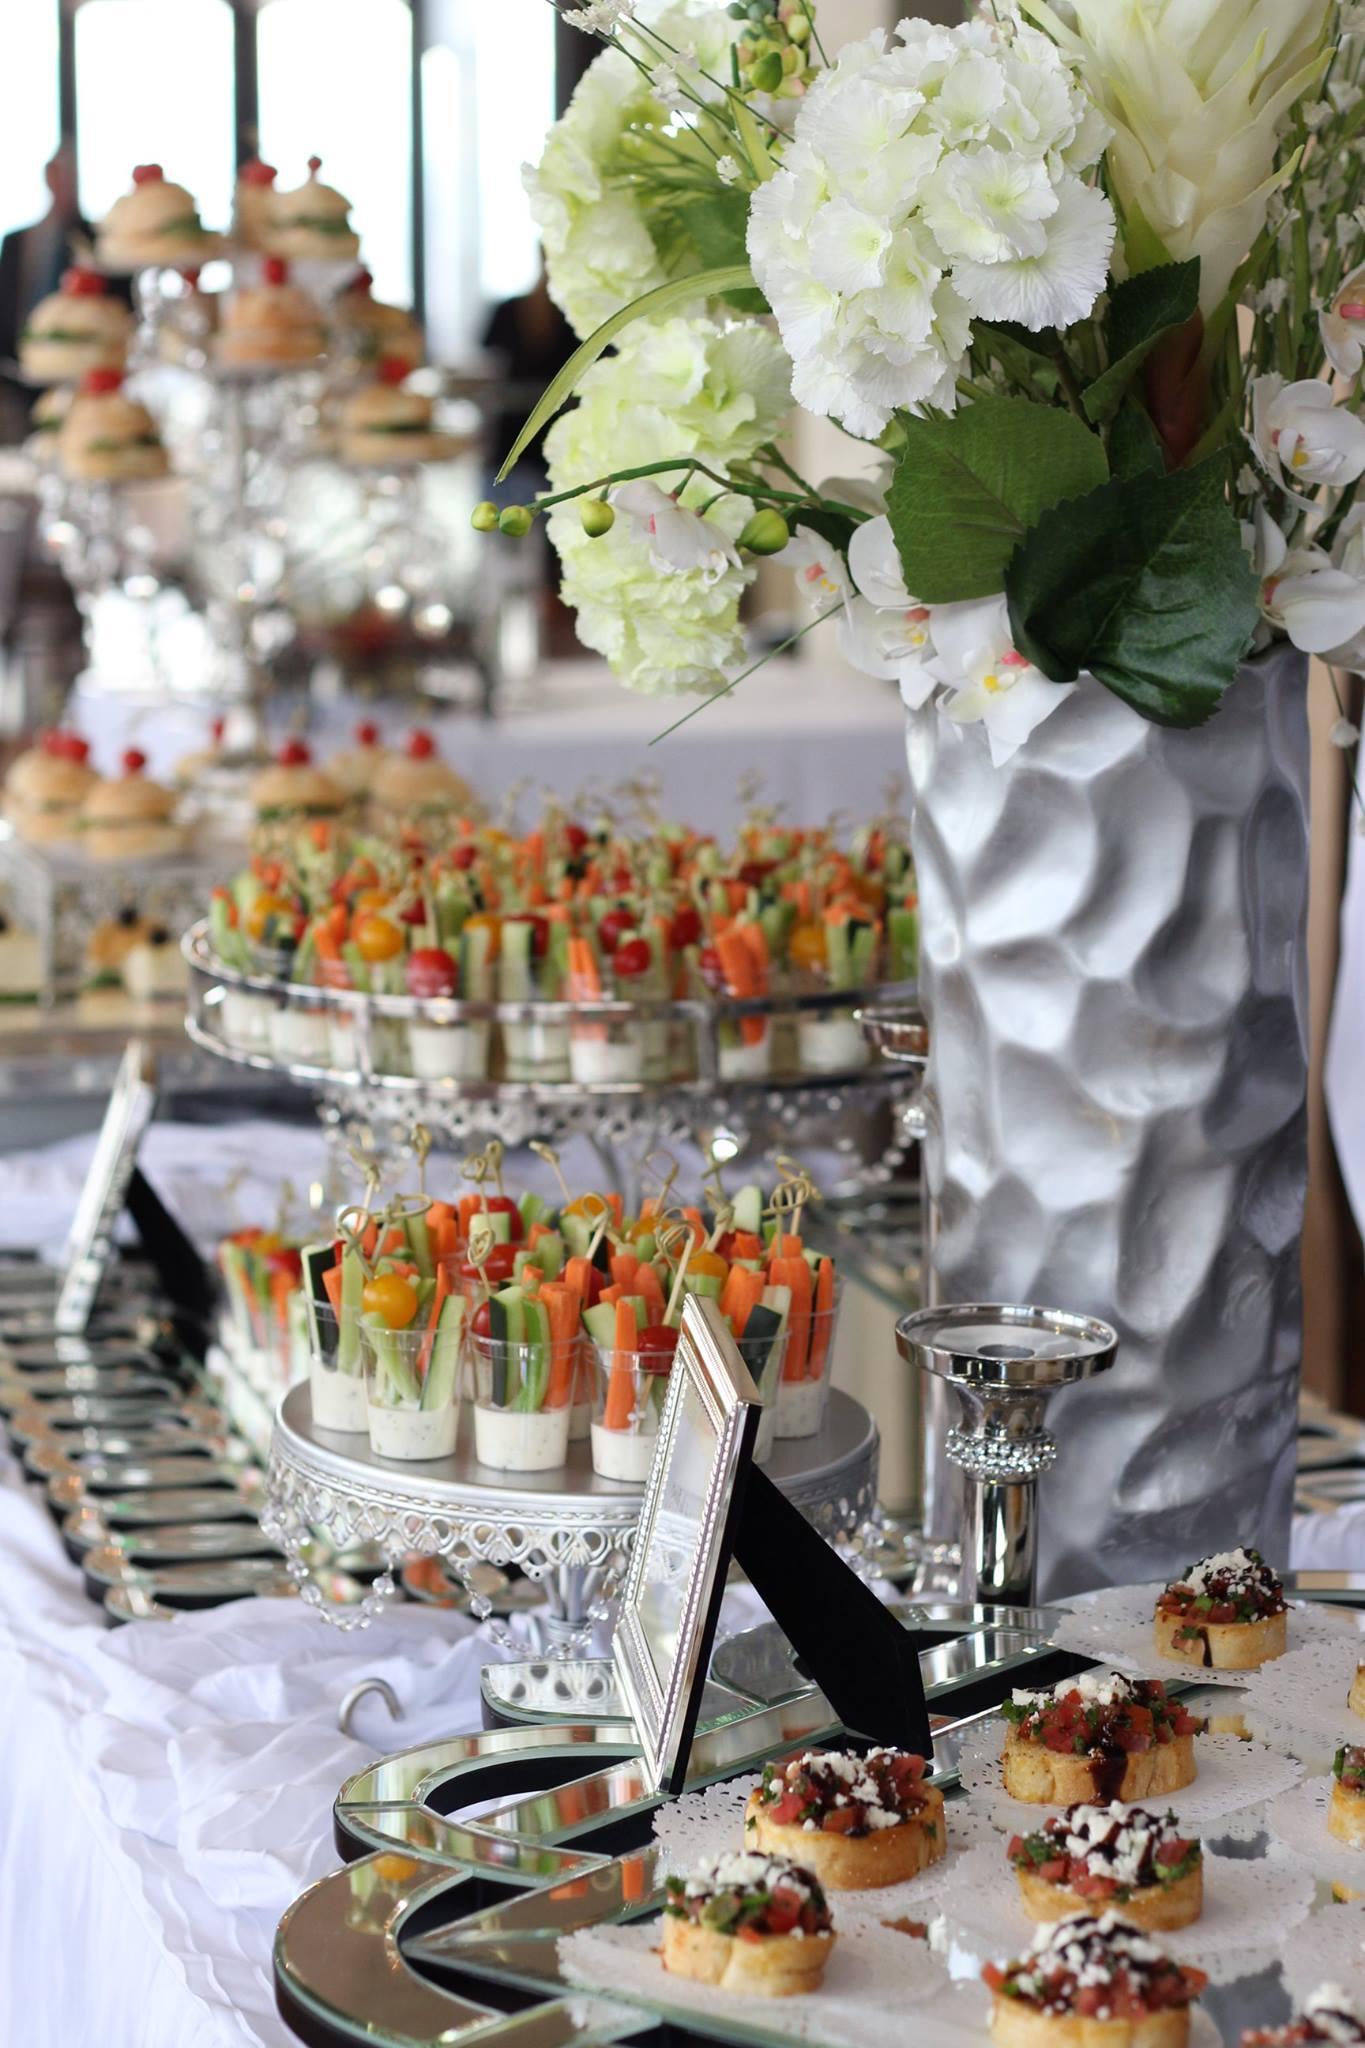 Weddings The Brulee Catering